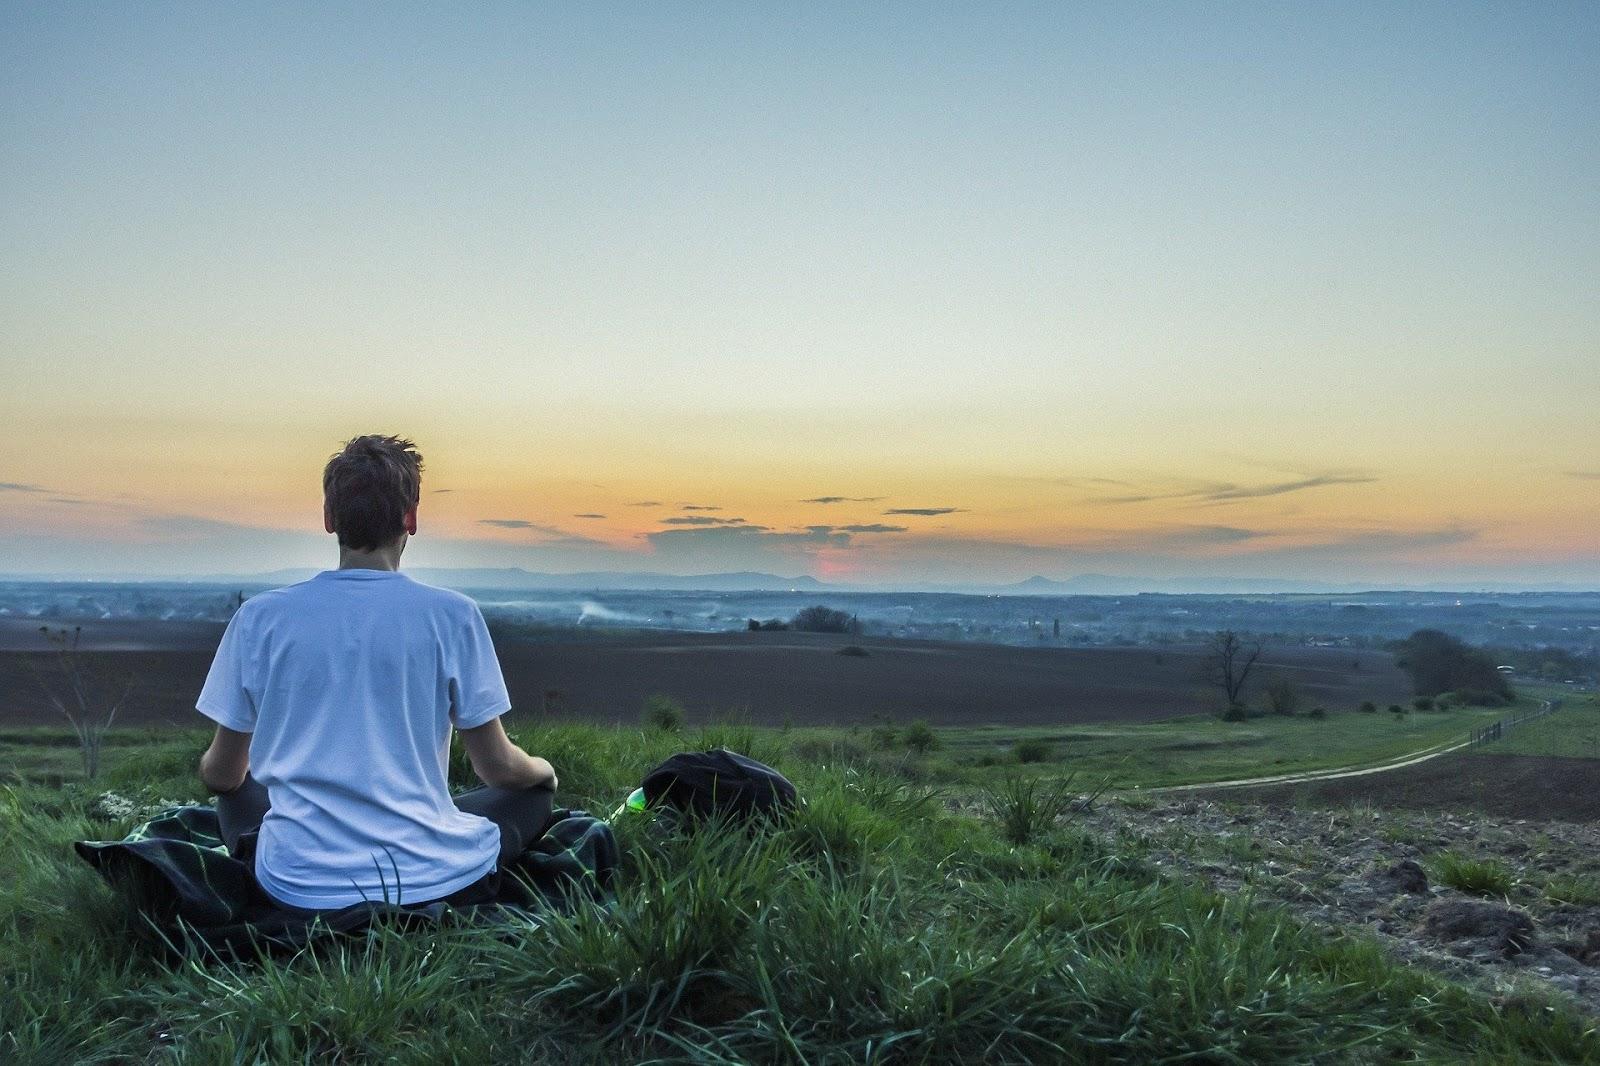 kelola stress dengan baik agar daya tahan tubuh terjaga